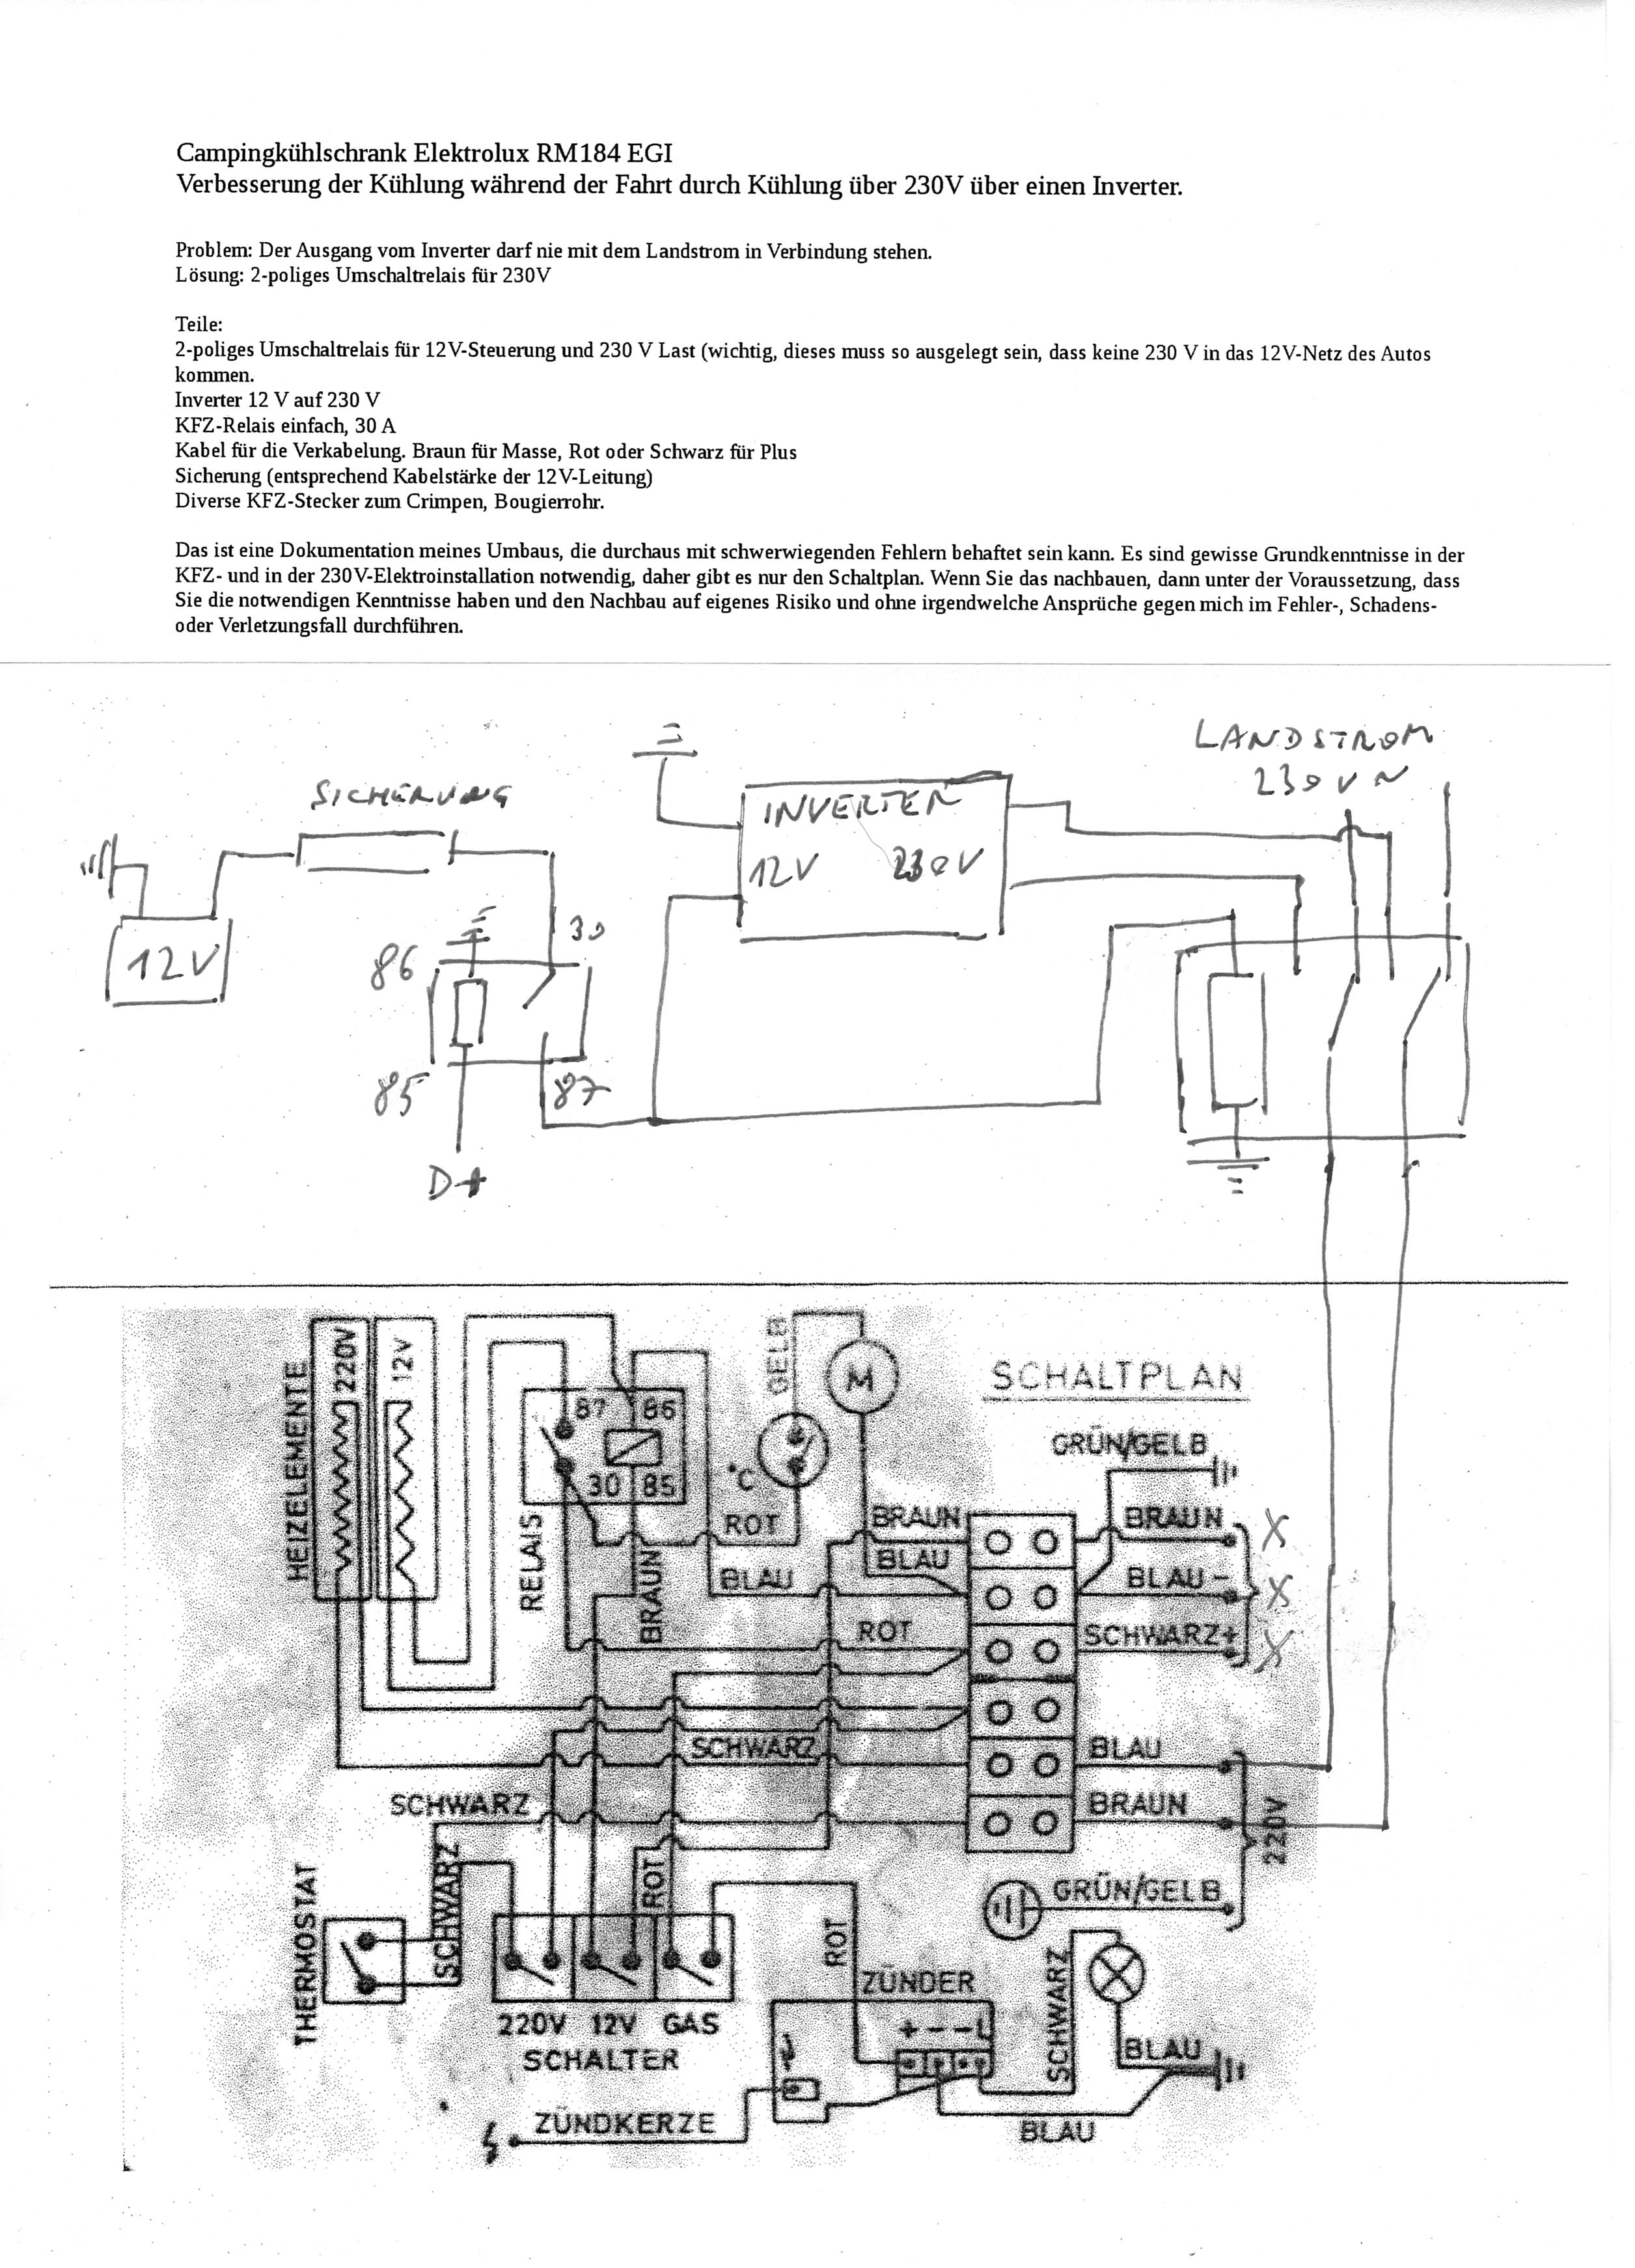 Camping Kühlschrank Electrolux Rm 4230 - Killen Otelia Blog